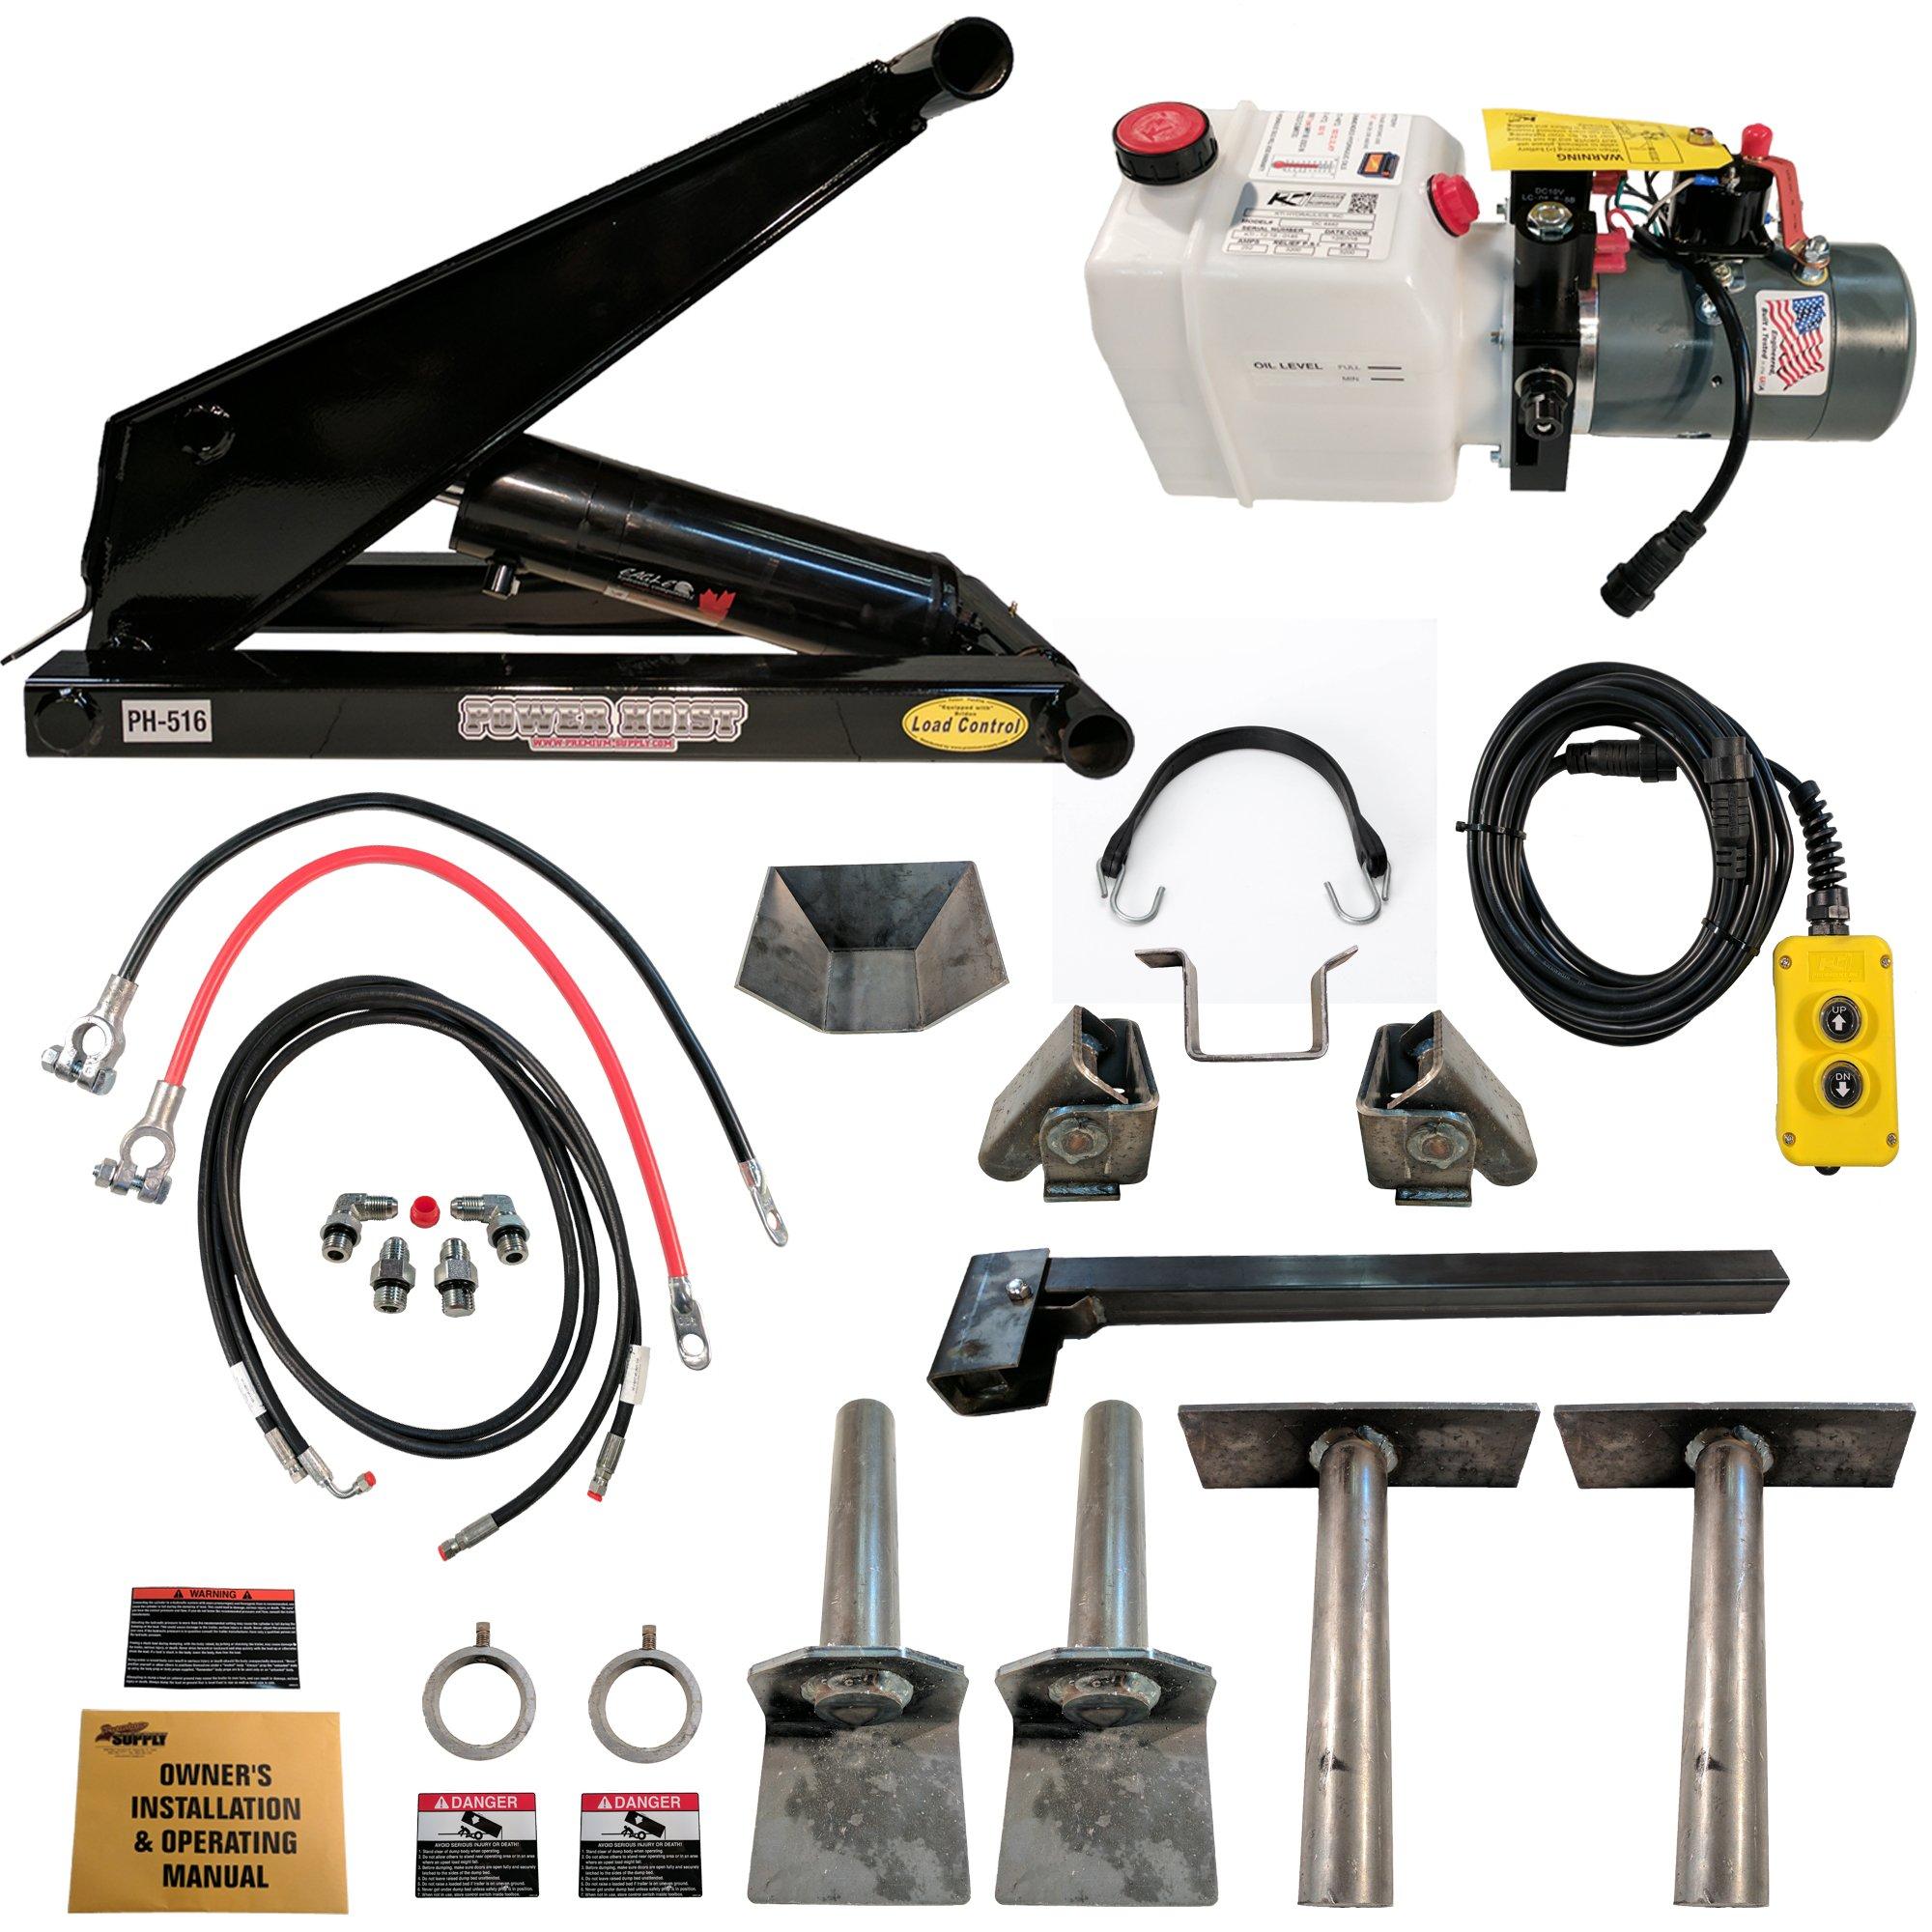 Hydraulic Hoist Kit- 16,000 lbs- Dump Trailer- 12V- Scissor Hoist Kit Complete. by Premium Supply